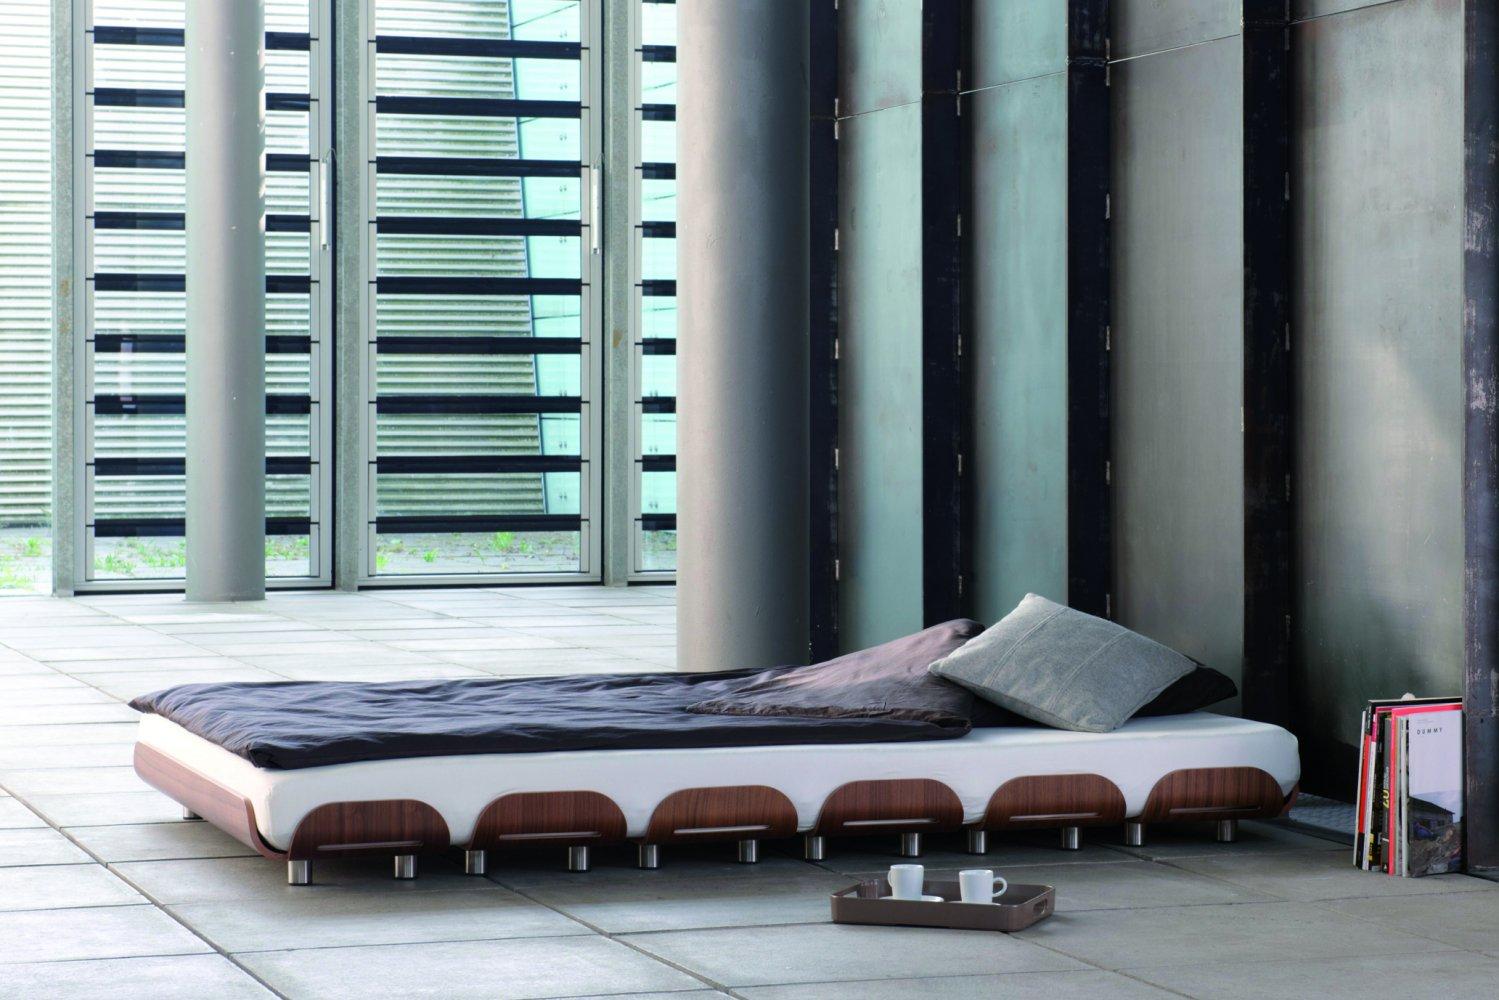 roomeon blog stadtnomaden flexibles wohnen aus stuttgart. Black Bedroom Furniture Sets. Home Design Ideas